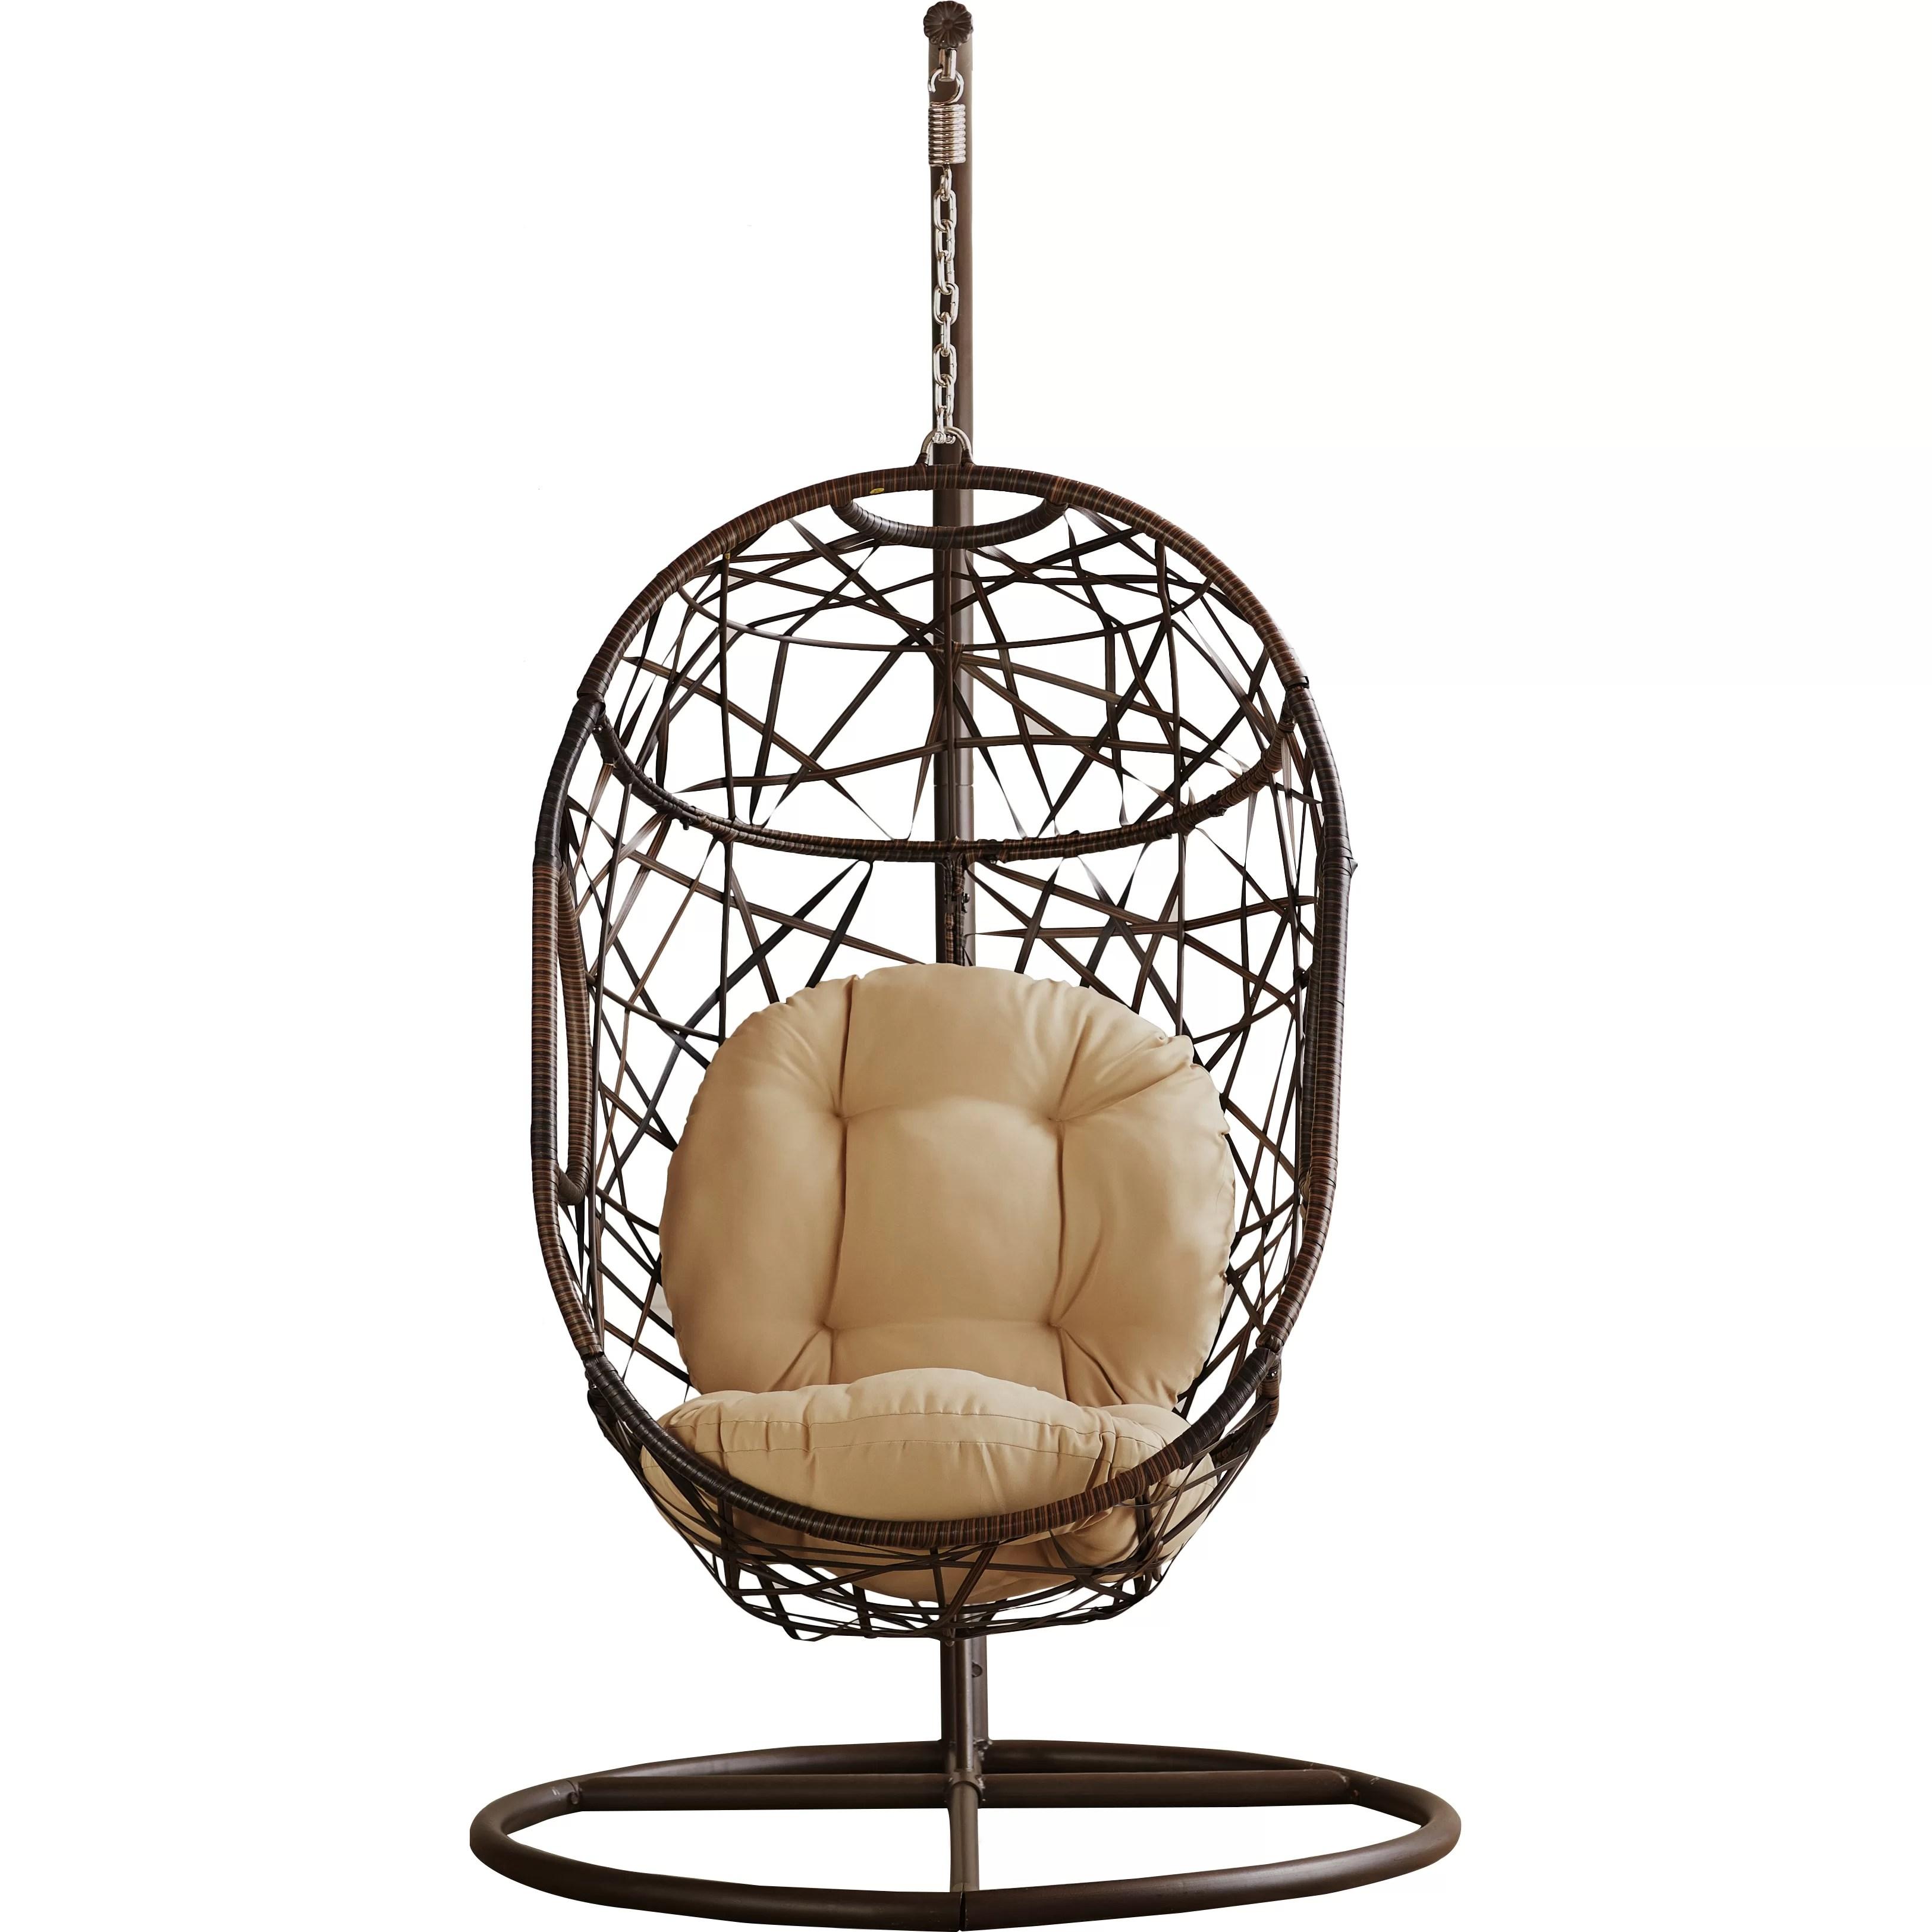 swing chair wayfair used herman miller aeron bay isle home duncombe hammock and reviews